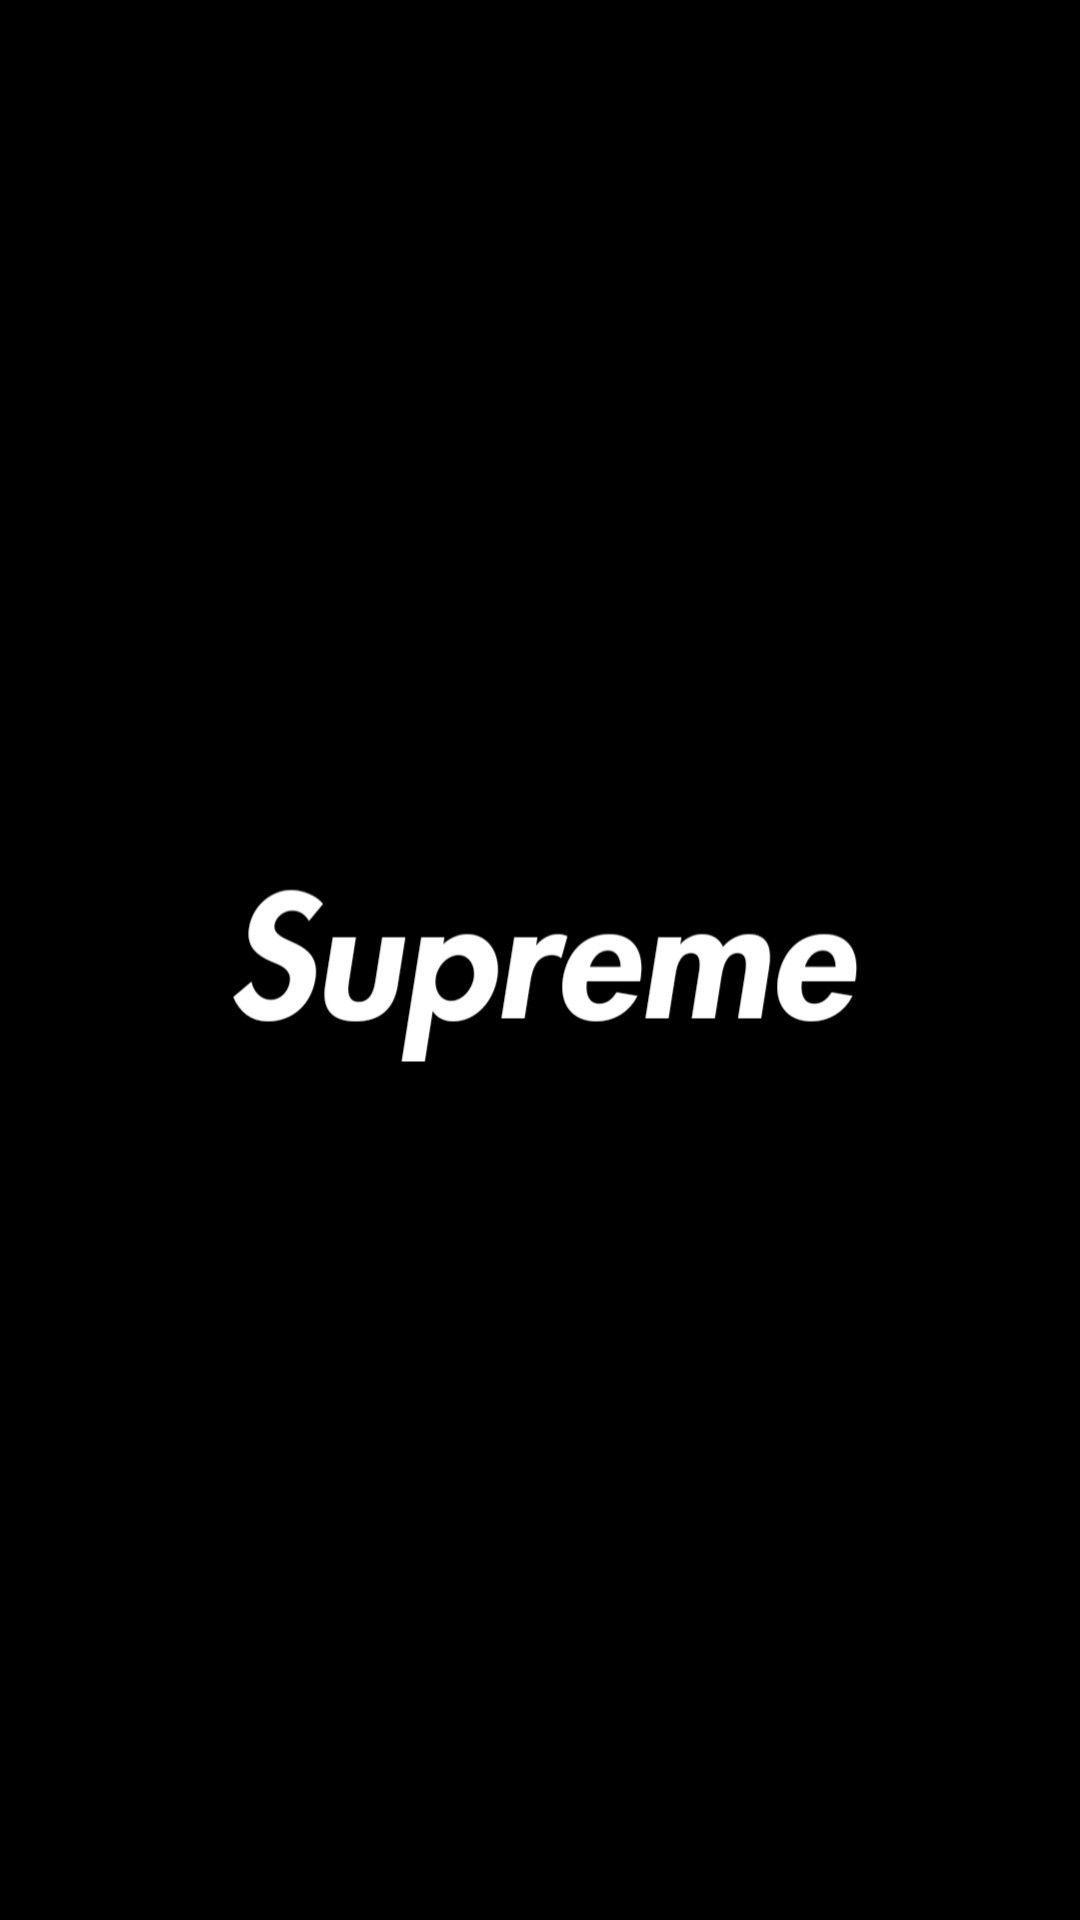 Black Supreme Logo Wallpapers Top Free Black Supreme Logo